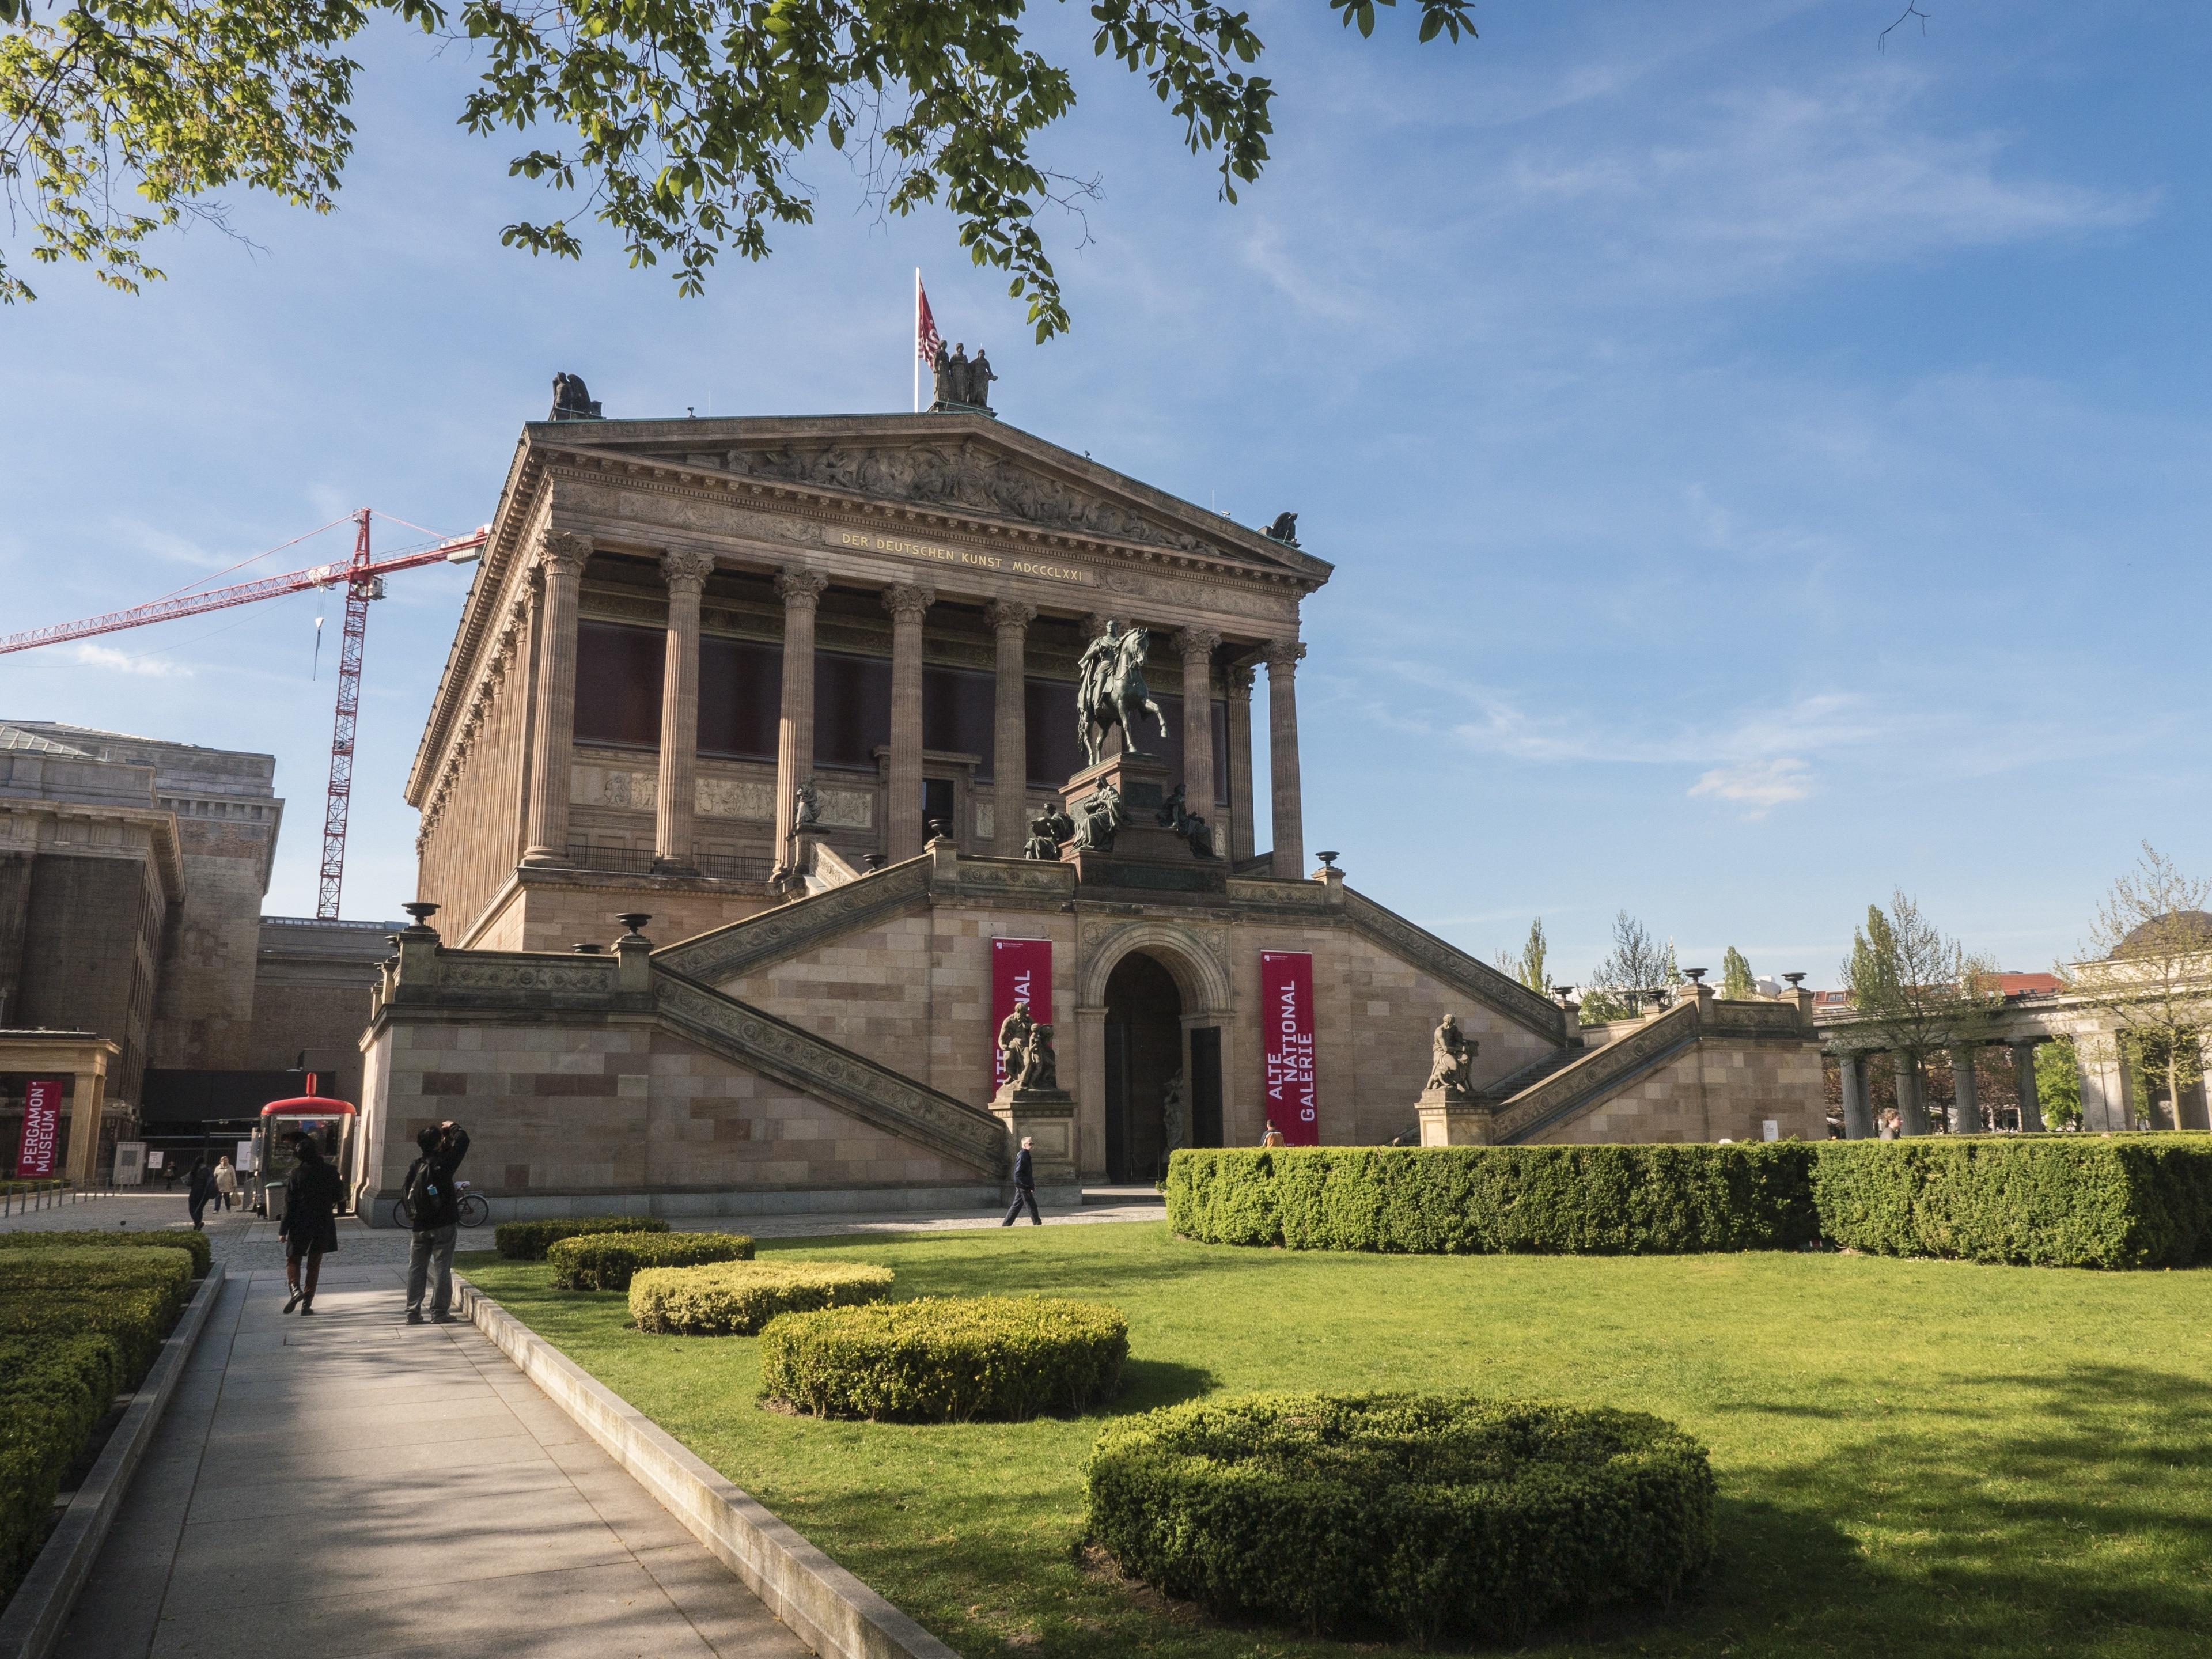 Berlino, Ohio, Stati Uniti d'America